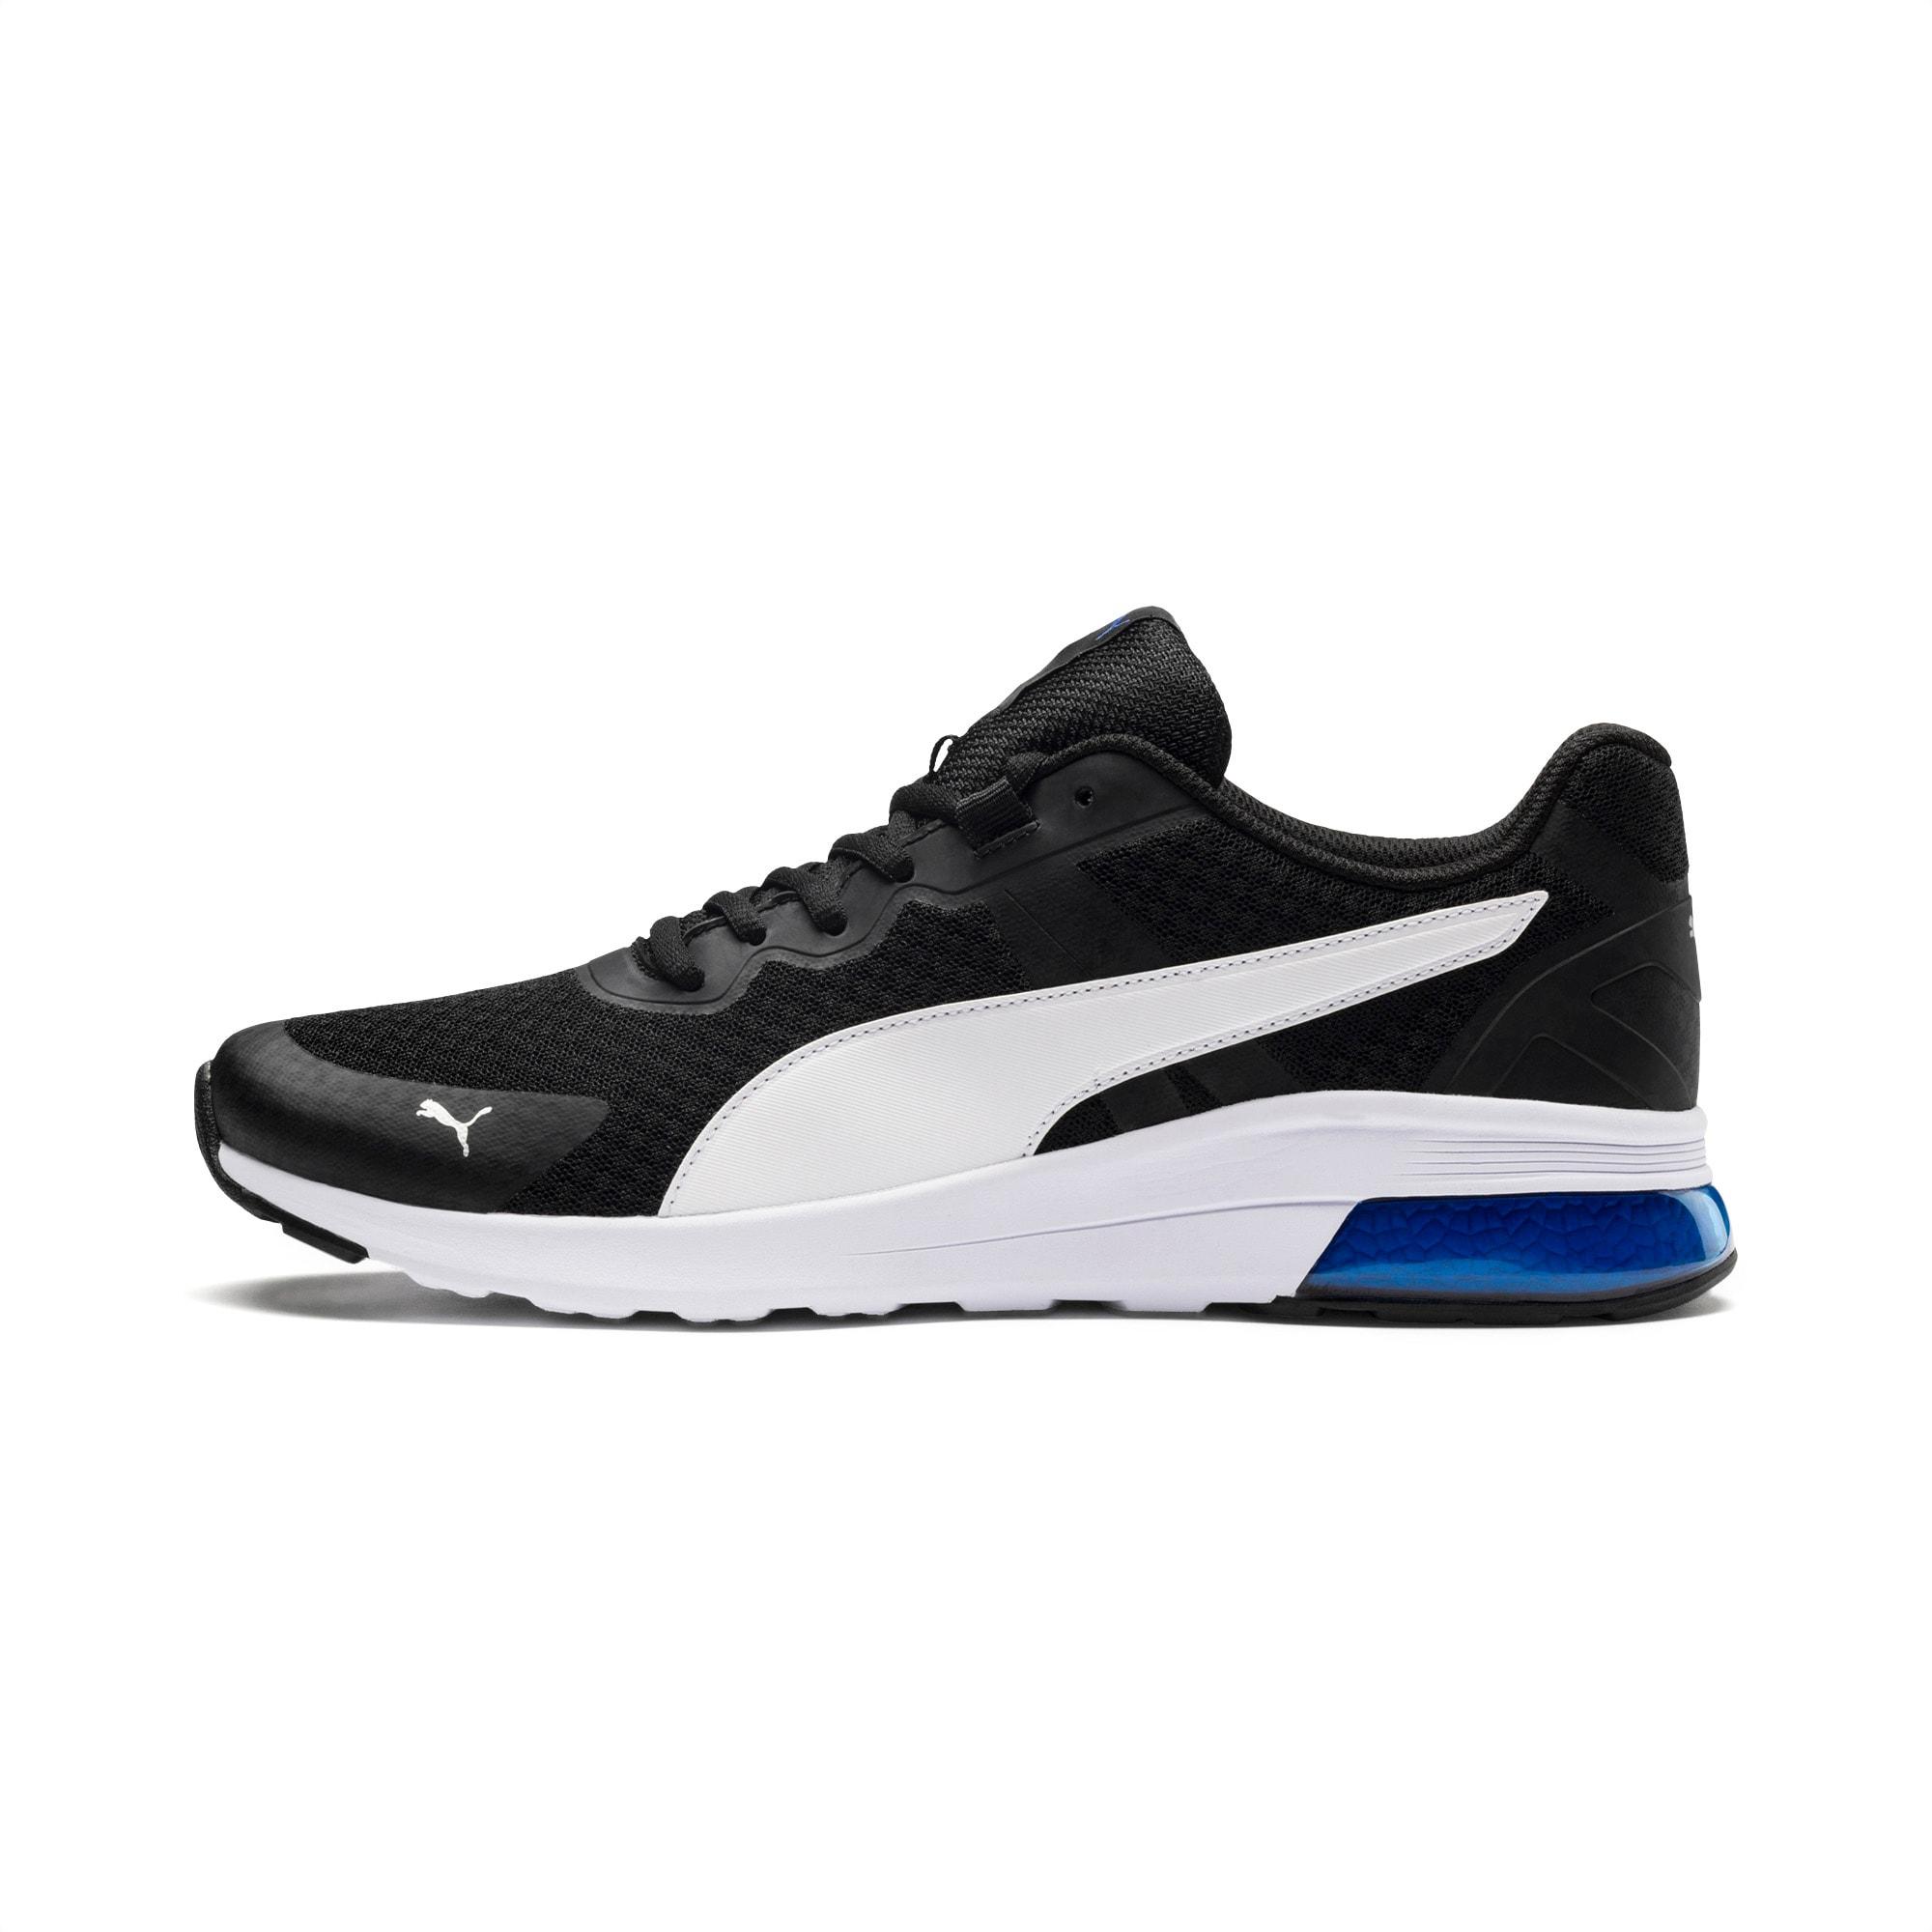 Zapatillas Electron, Blanco/Azul/Negro, Talla 41 | PUMA Mujeres